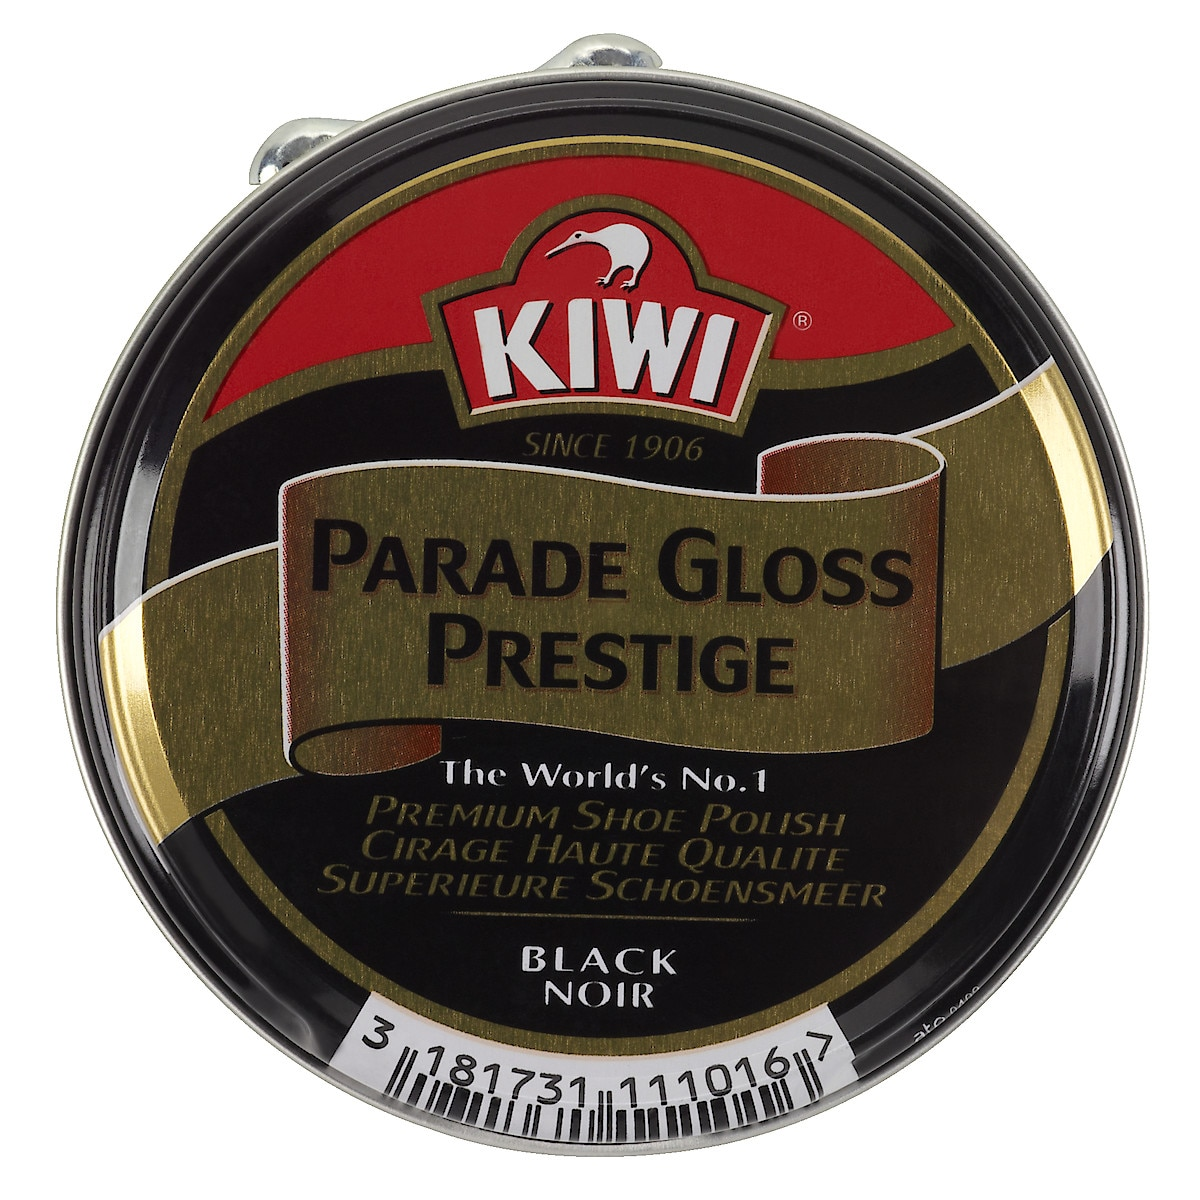 Skokrempasta, Kiwi svart